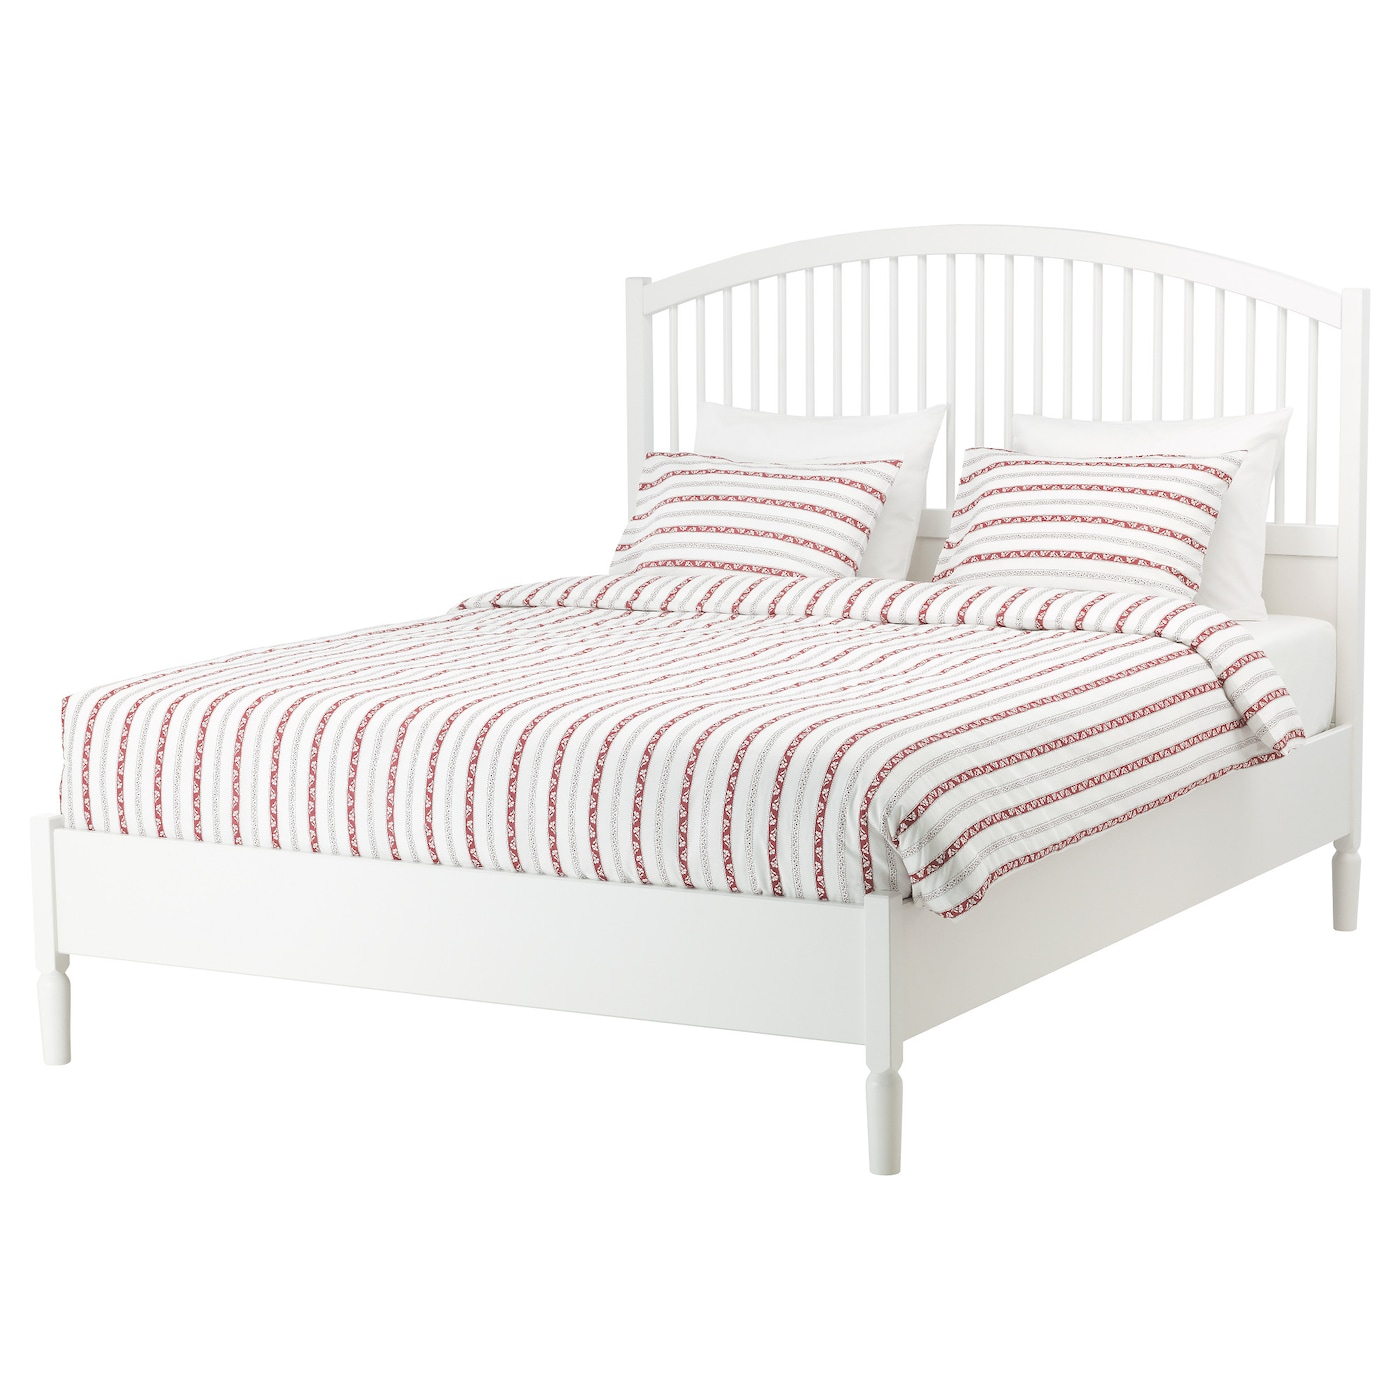 TYSSEDAL Bed frame White lönset Standard King IKEA